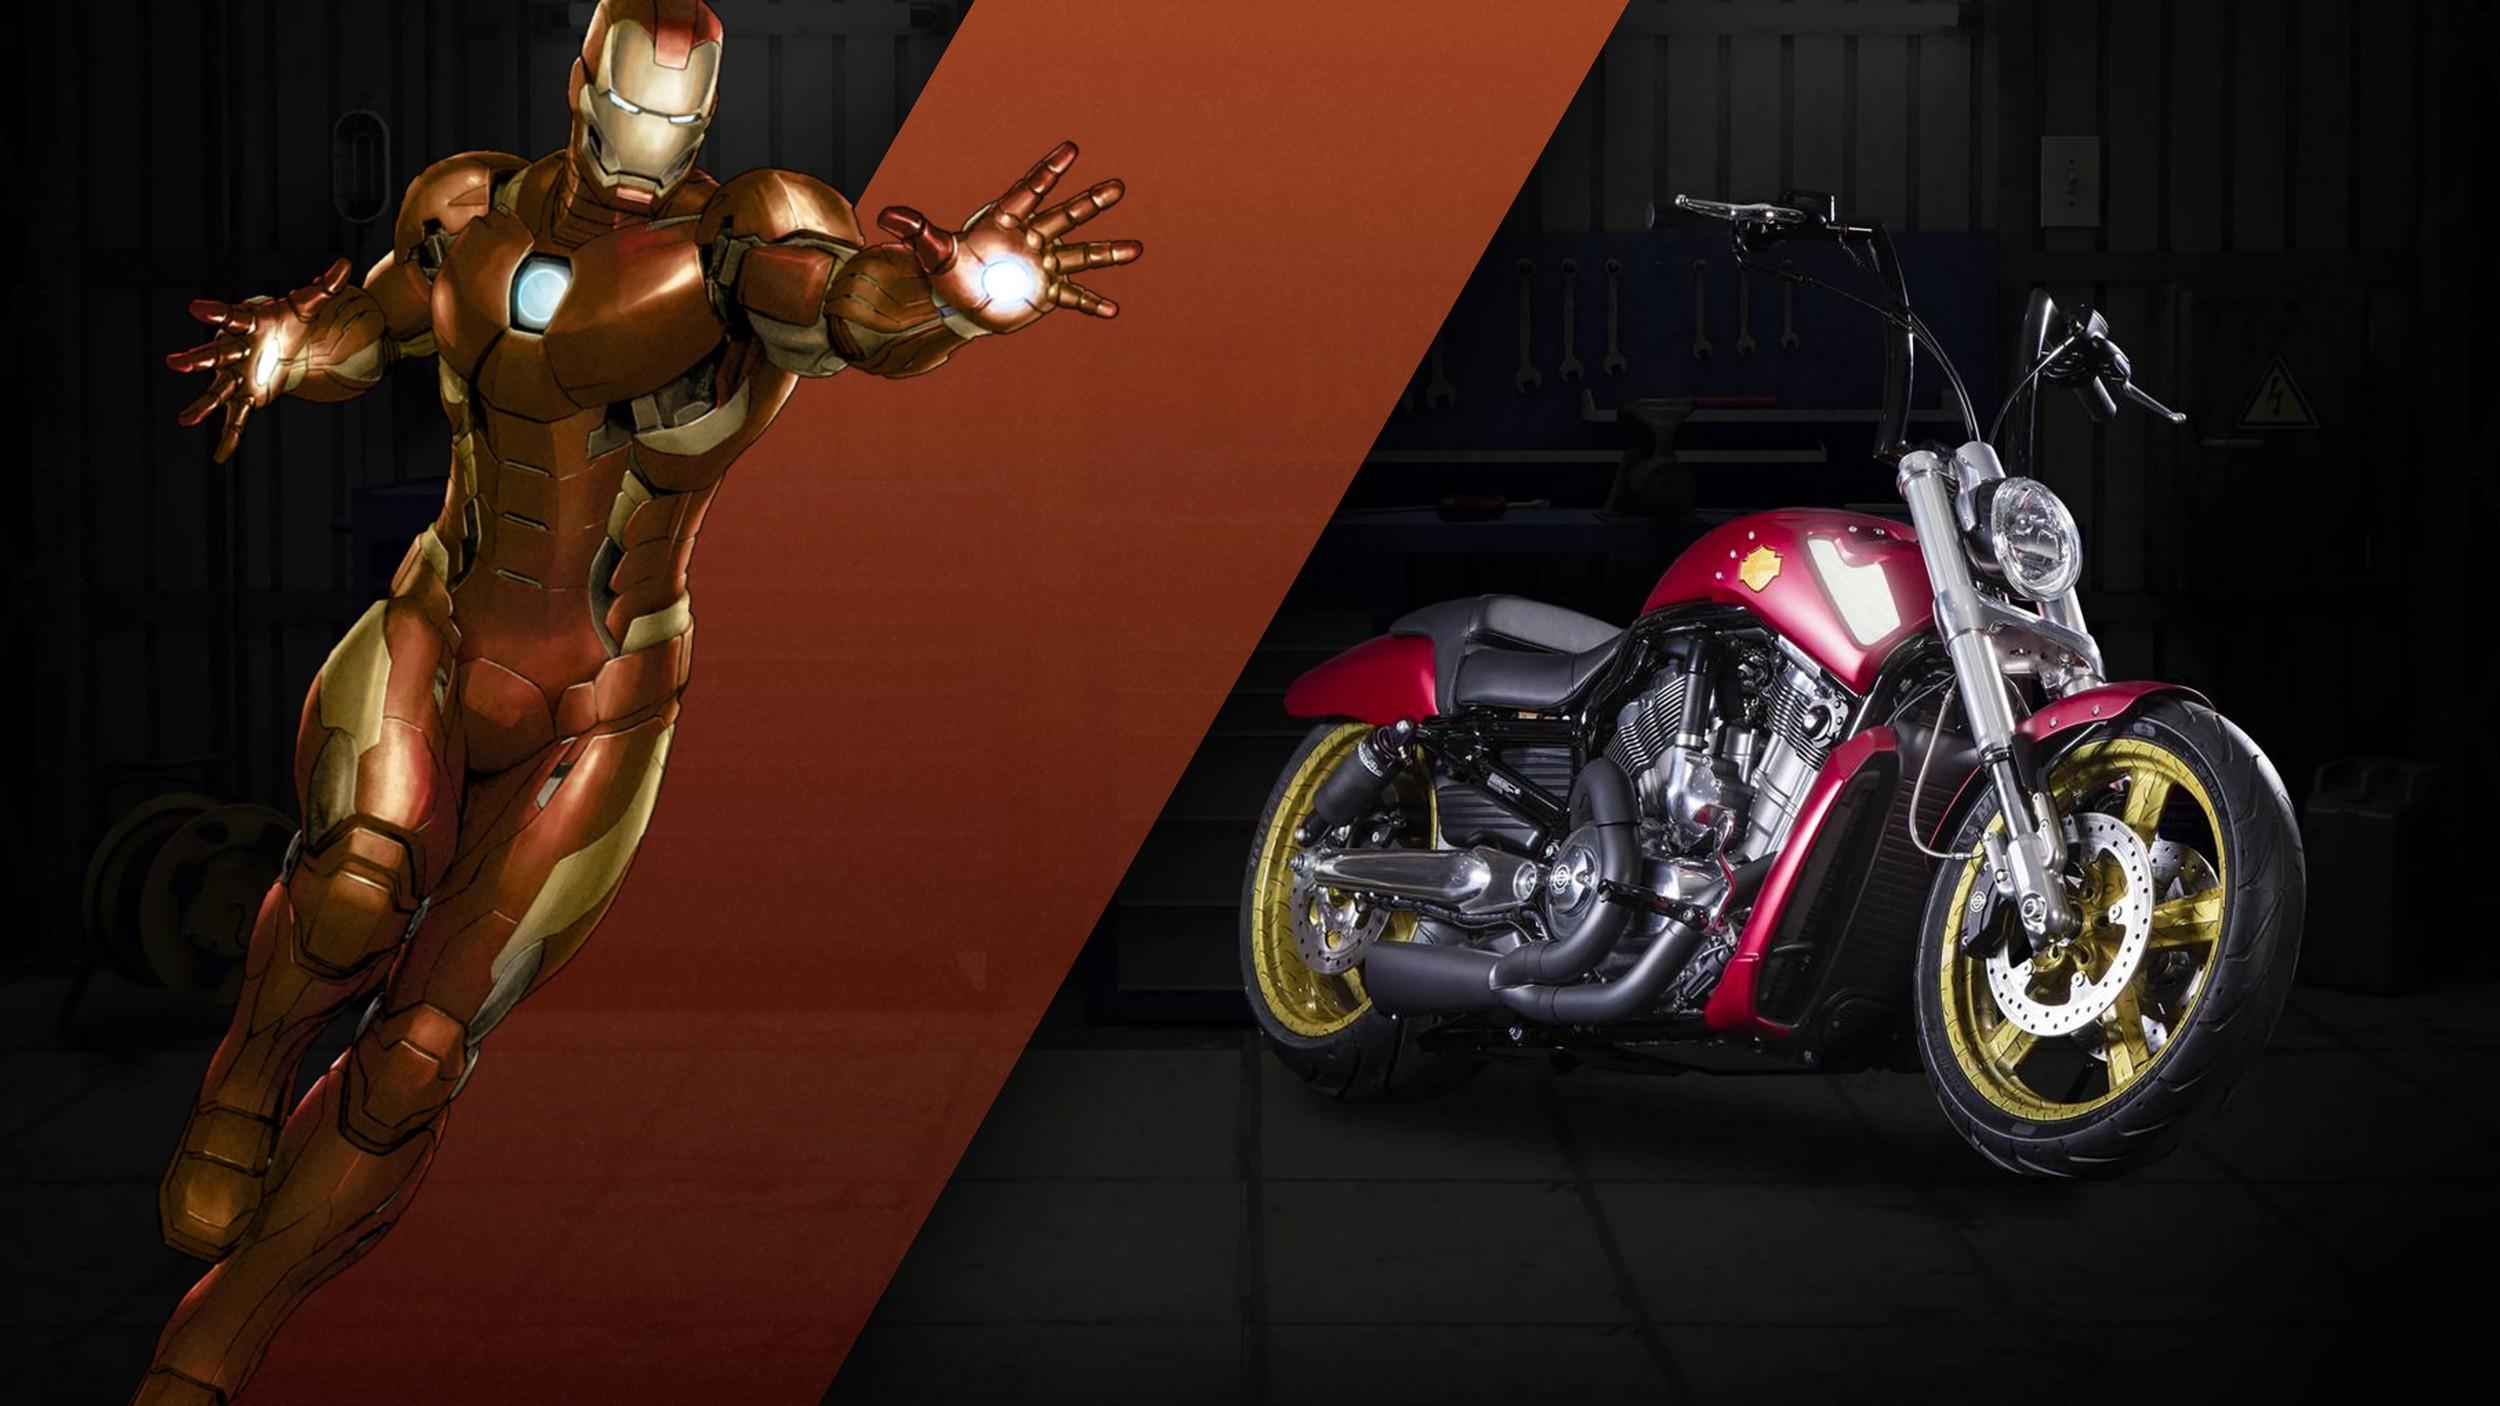 Marvel Superhero Harley Davidson Bikes Surface In The Land